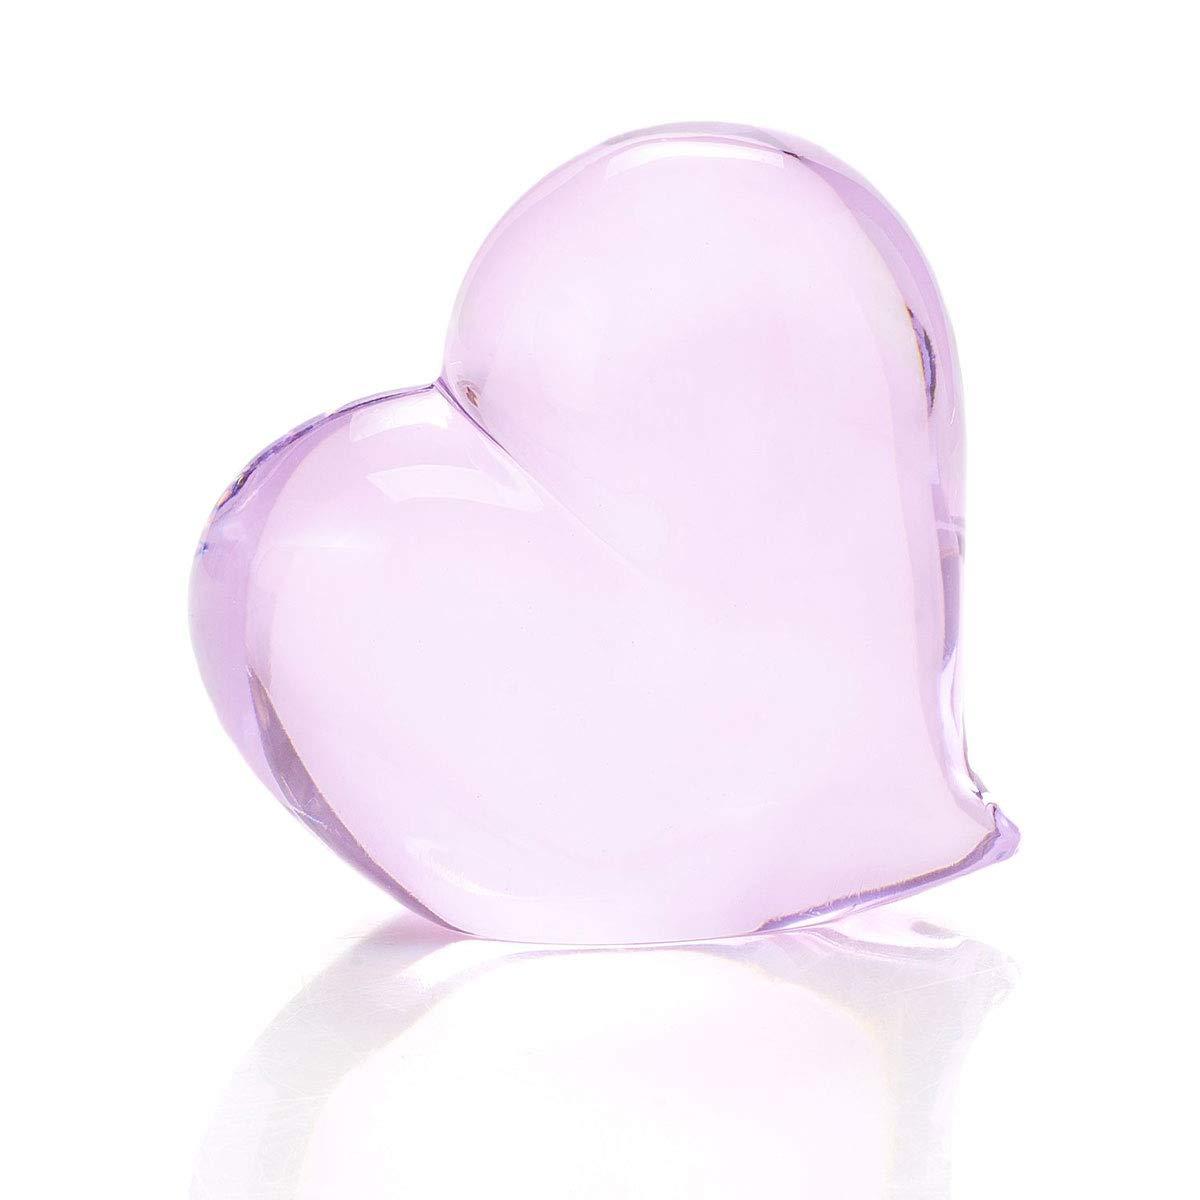 Waterford Crystal 4'' Tender Pink Heart Paperweight